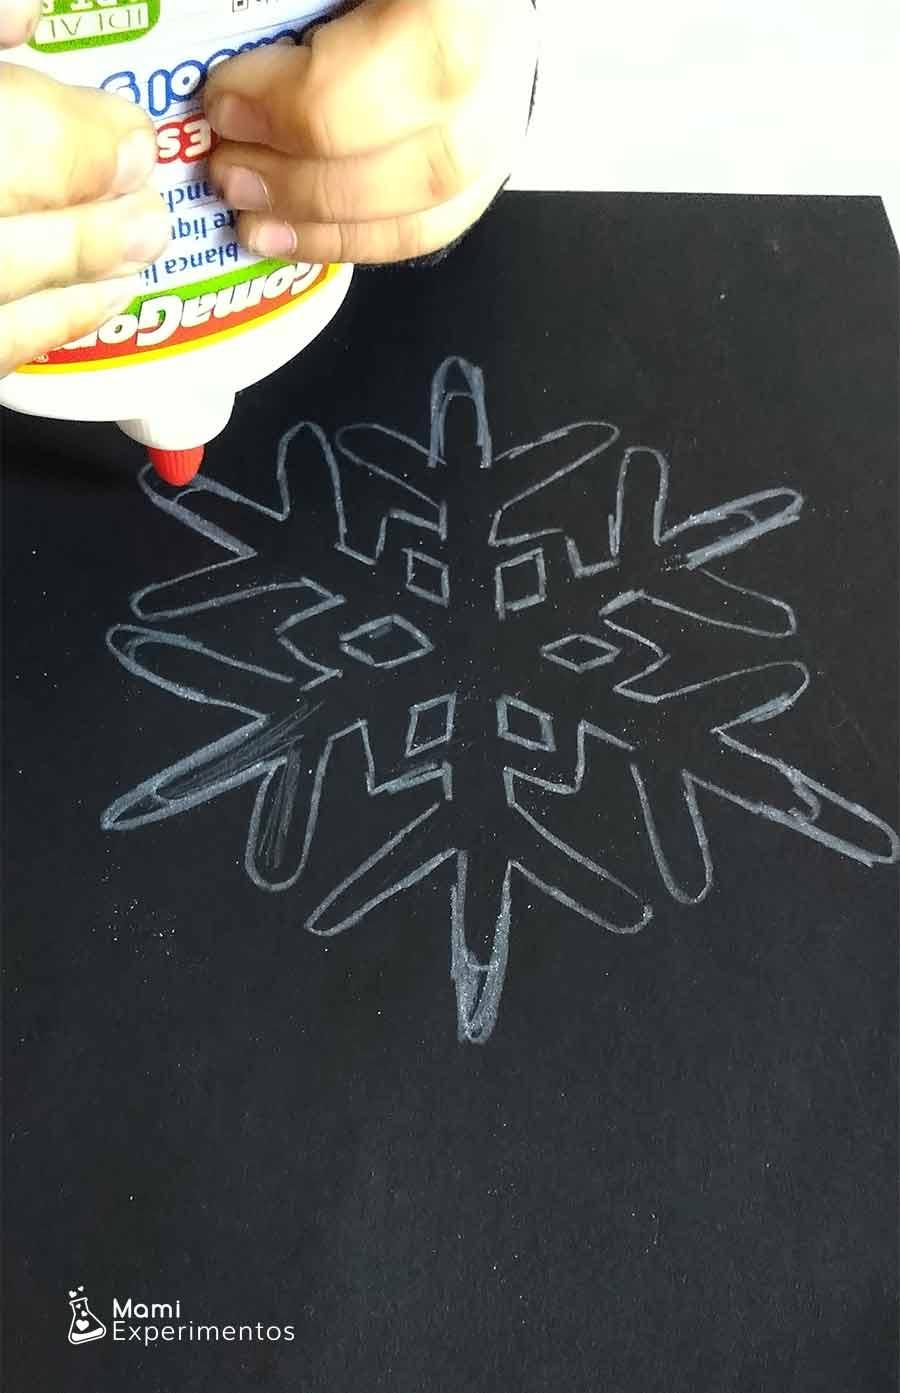 Pintar copo de nieve con cola blanca